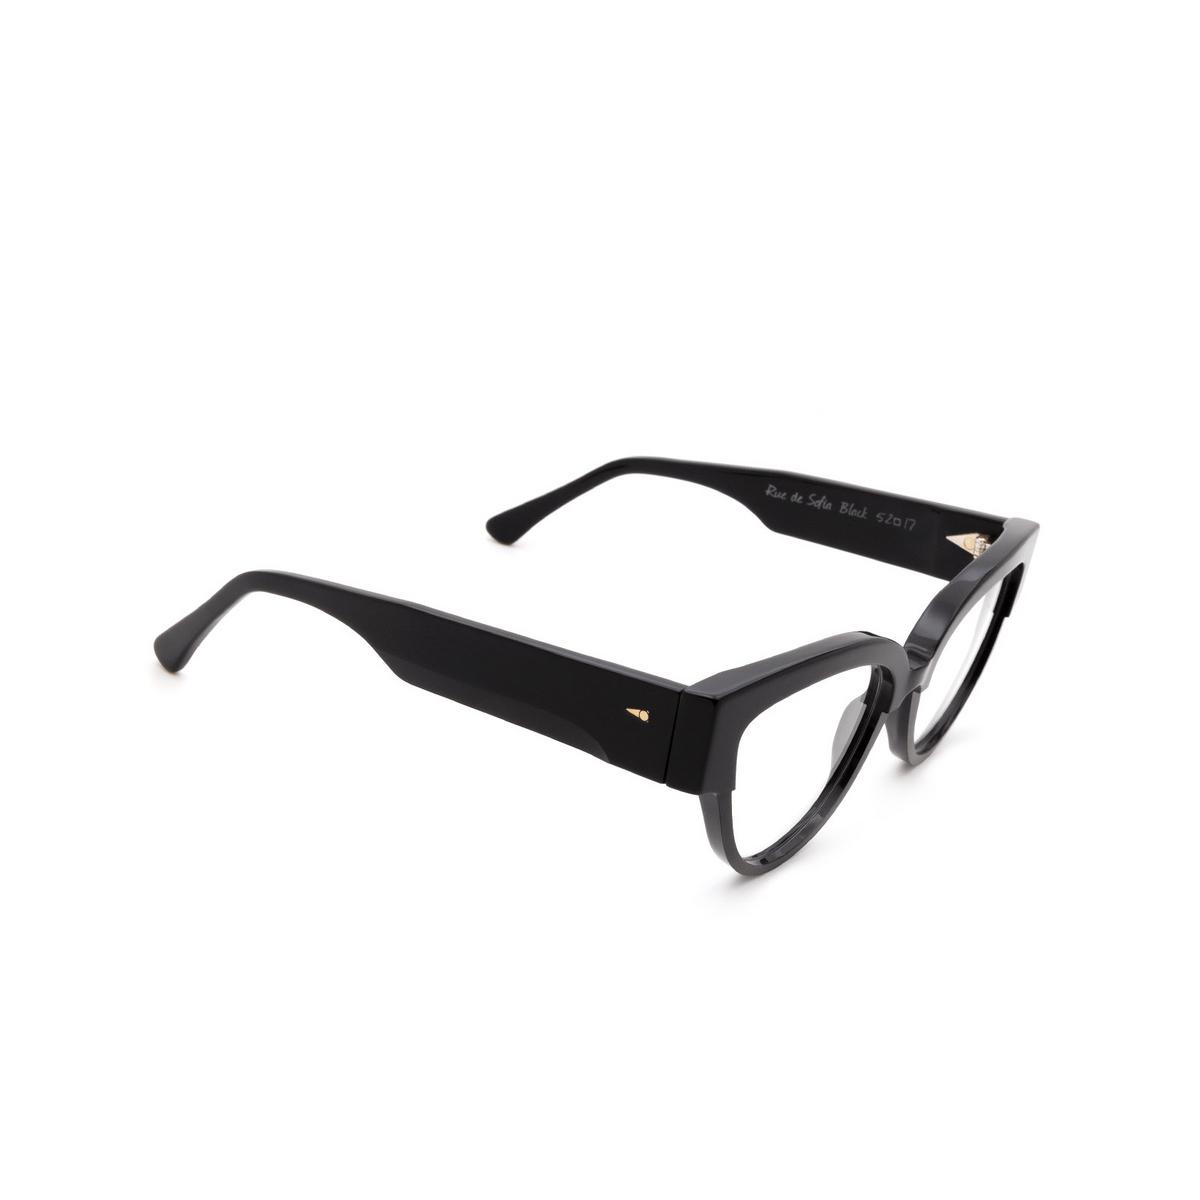 Ahlem® Butterfly Eyeglasses: Rue De Sofia Optic color Black.